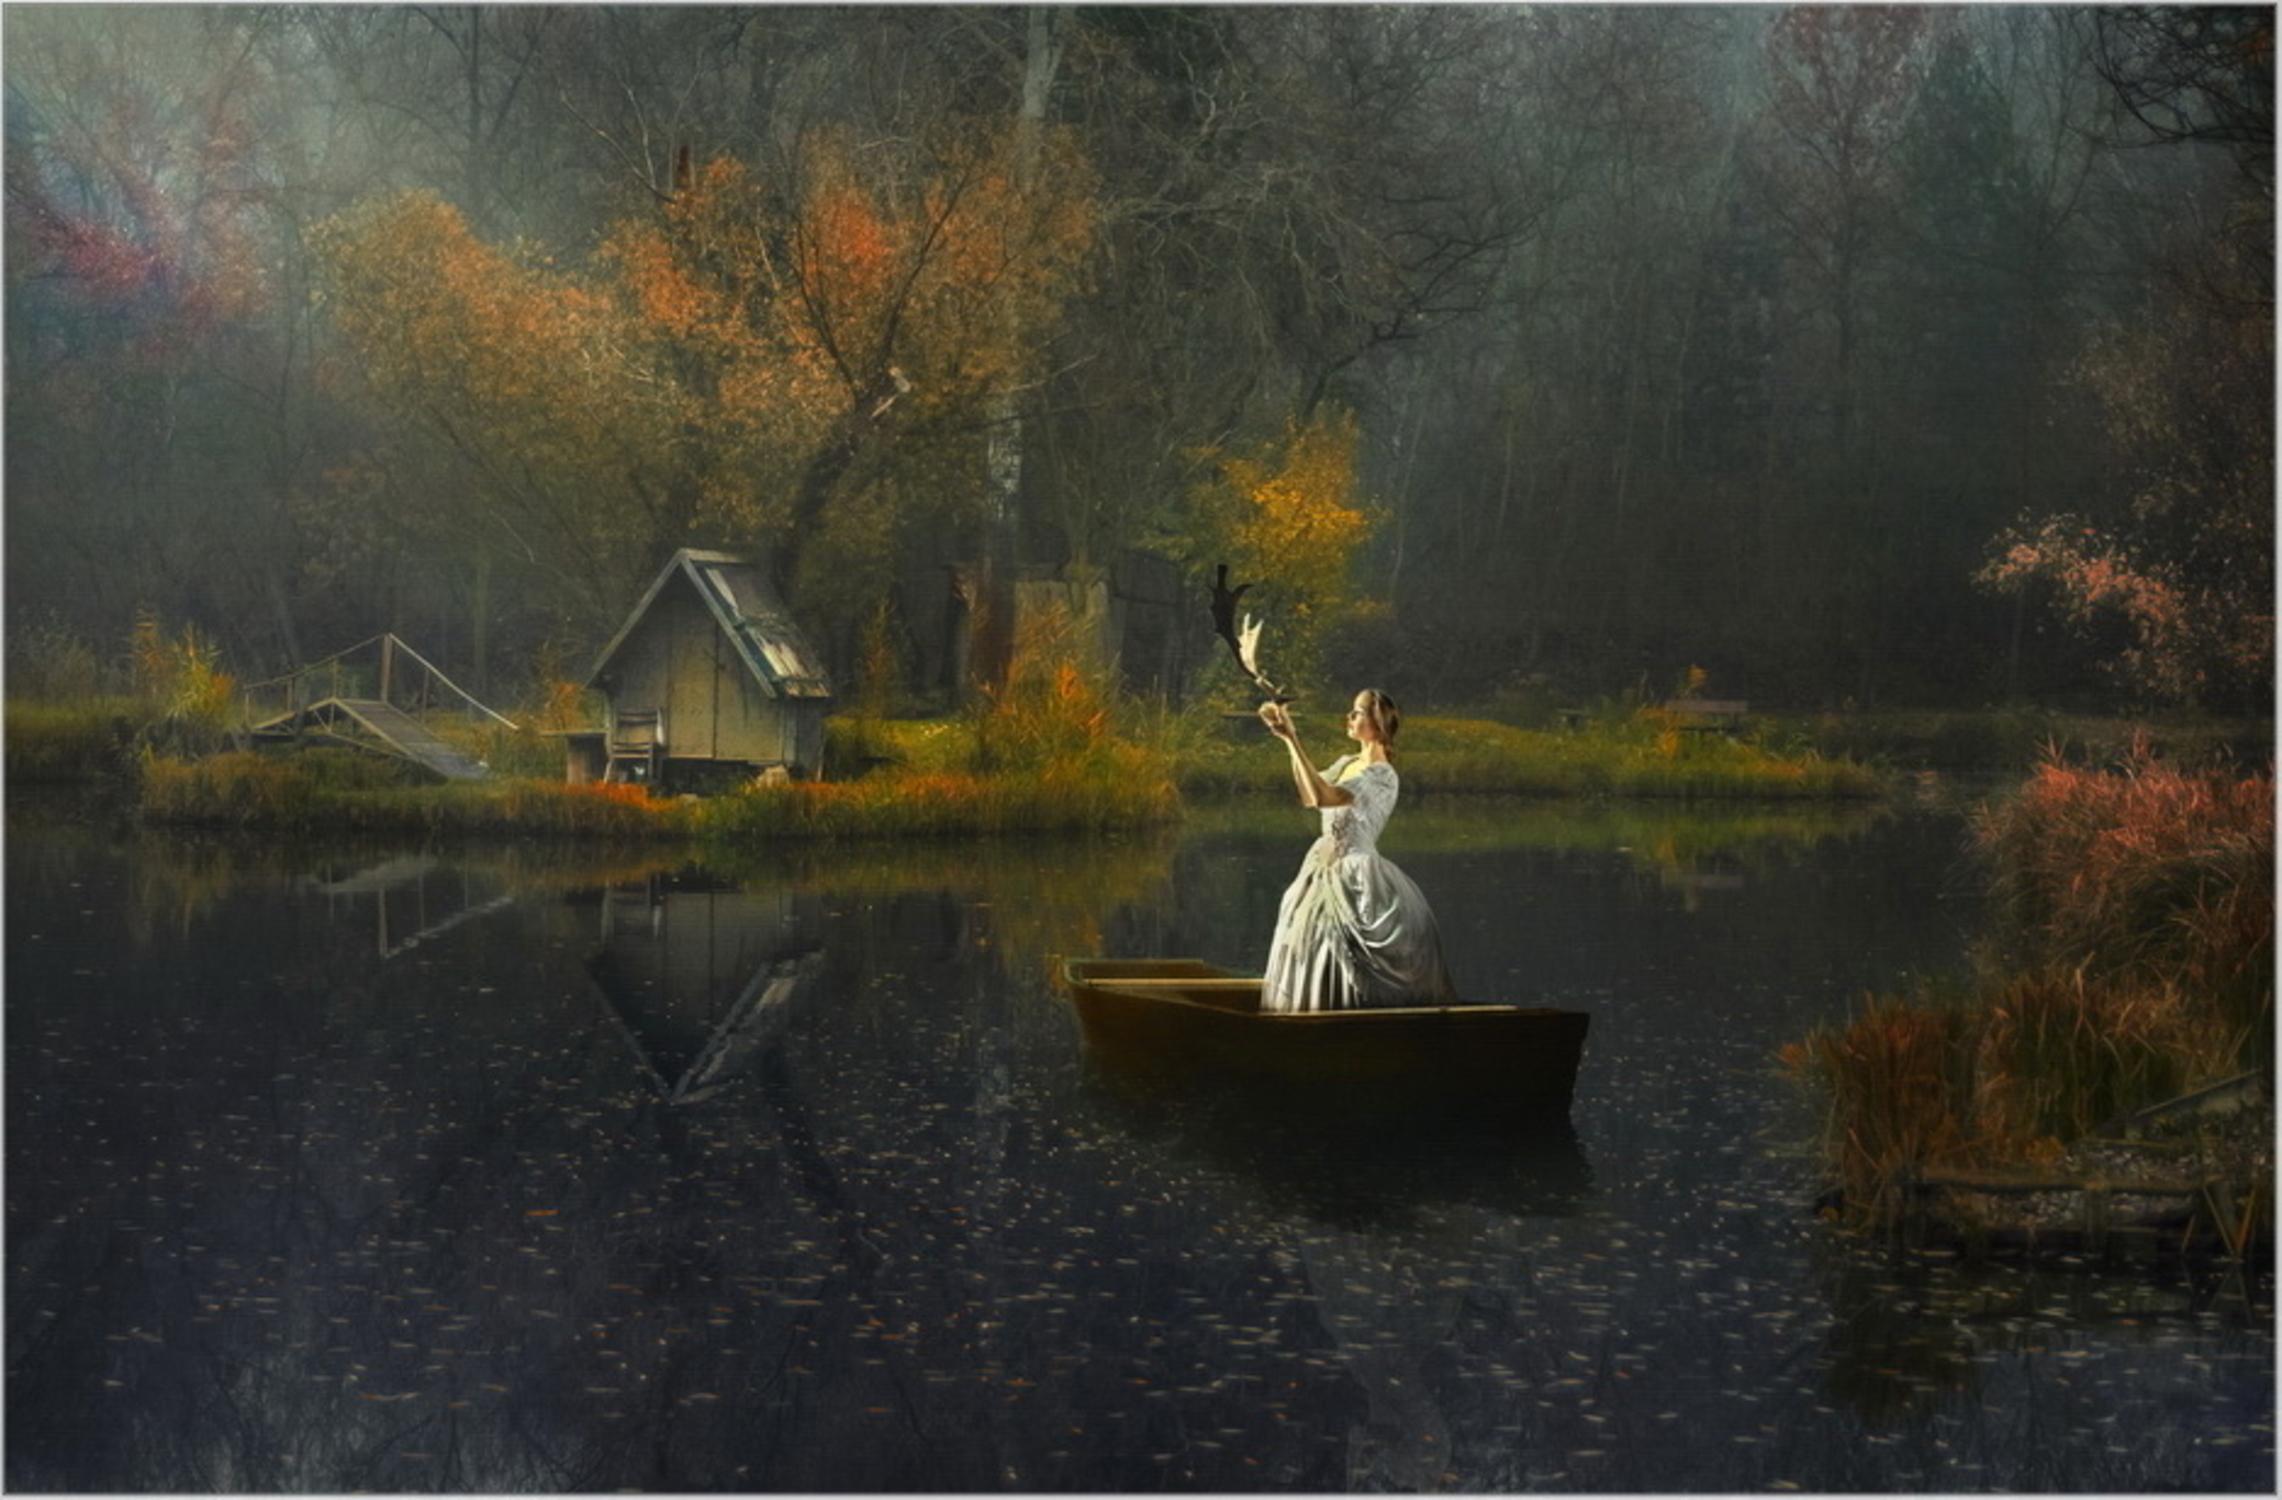 The Calling Artwork by Gabor Dvornik